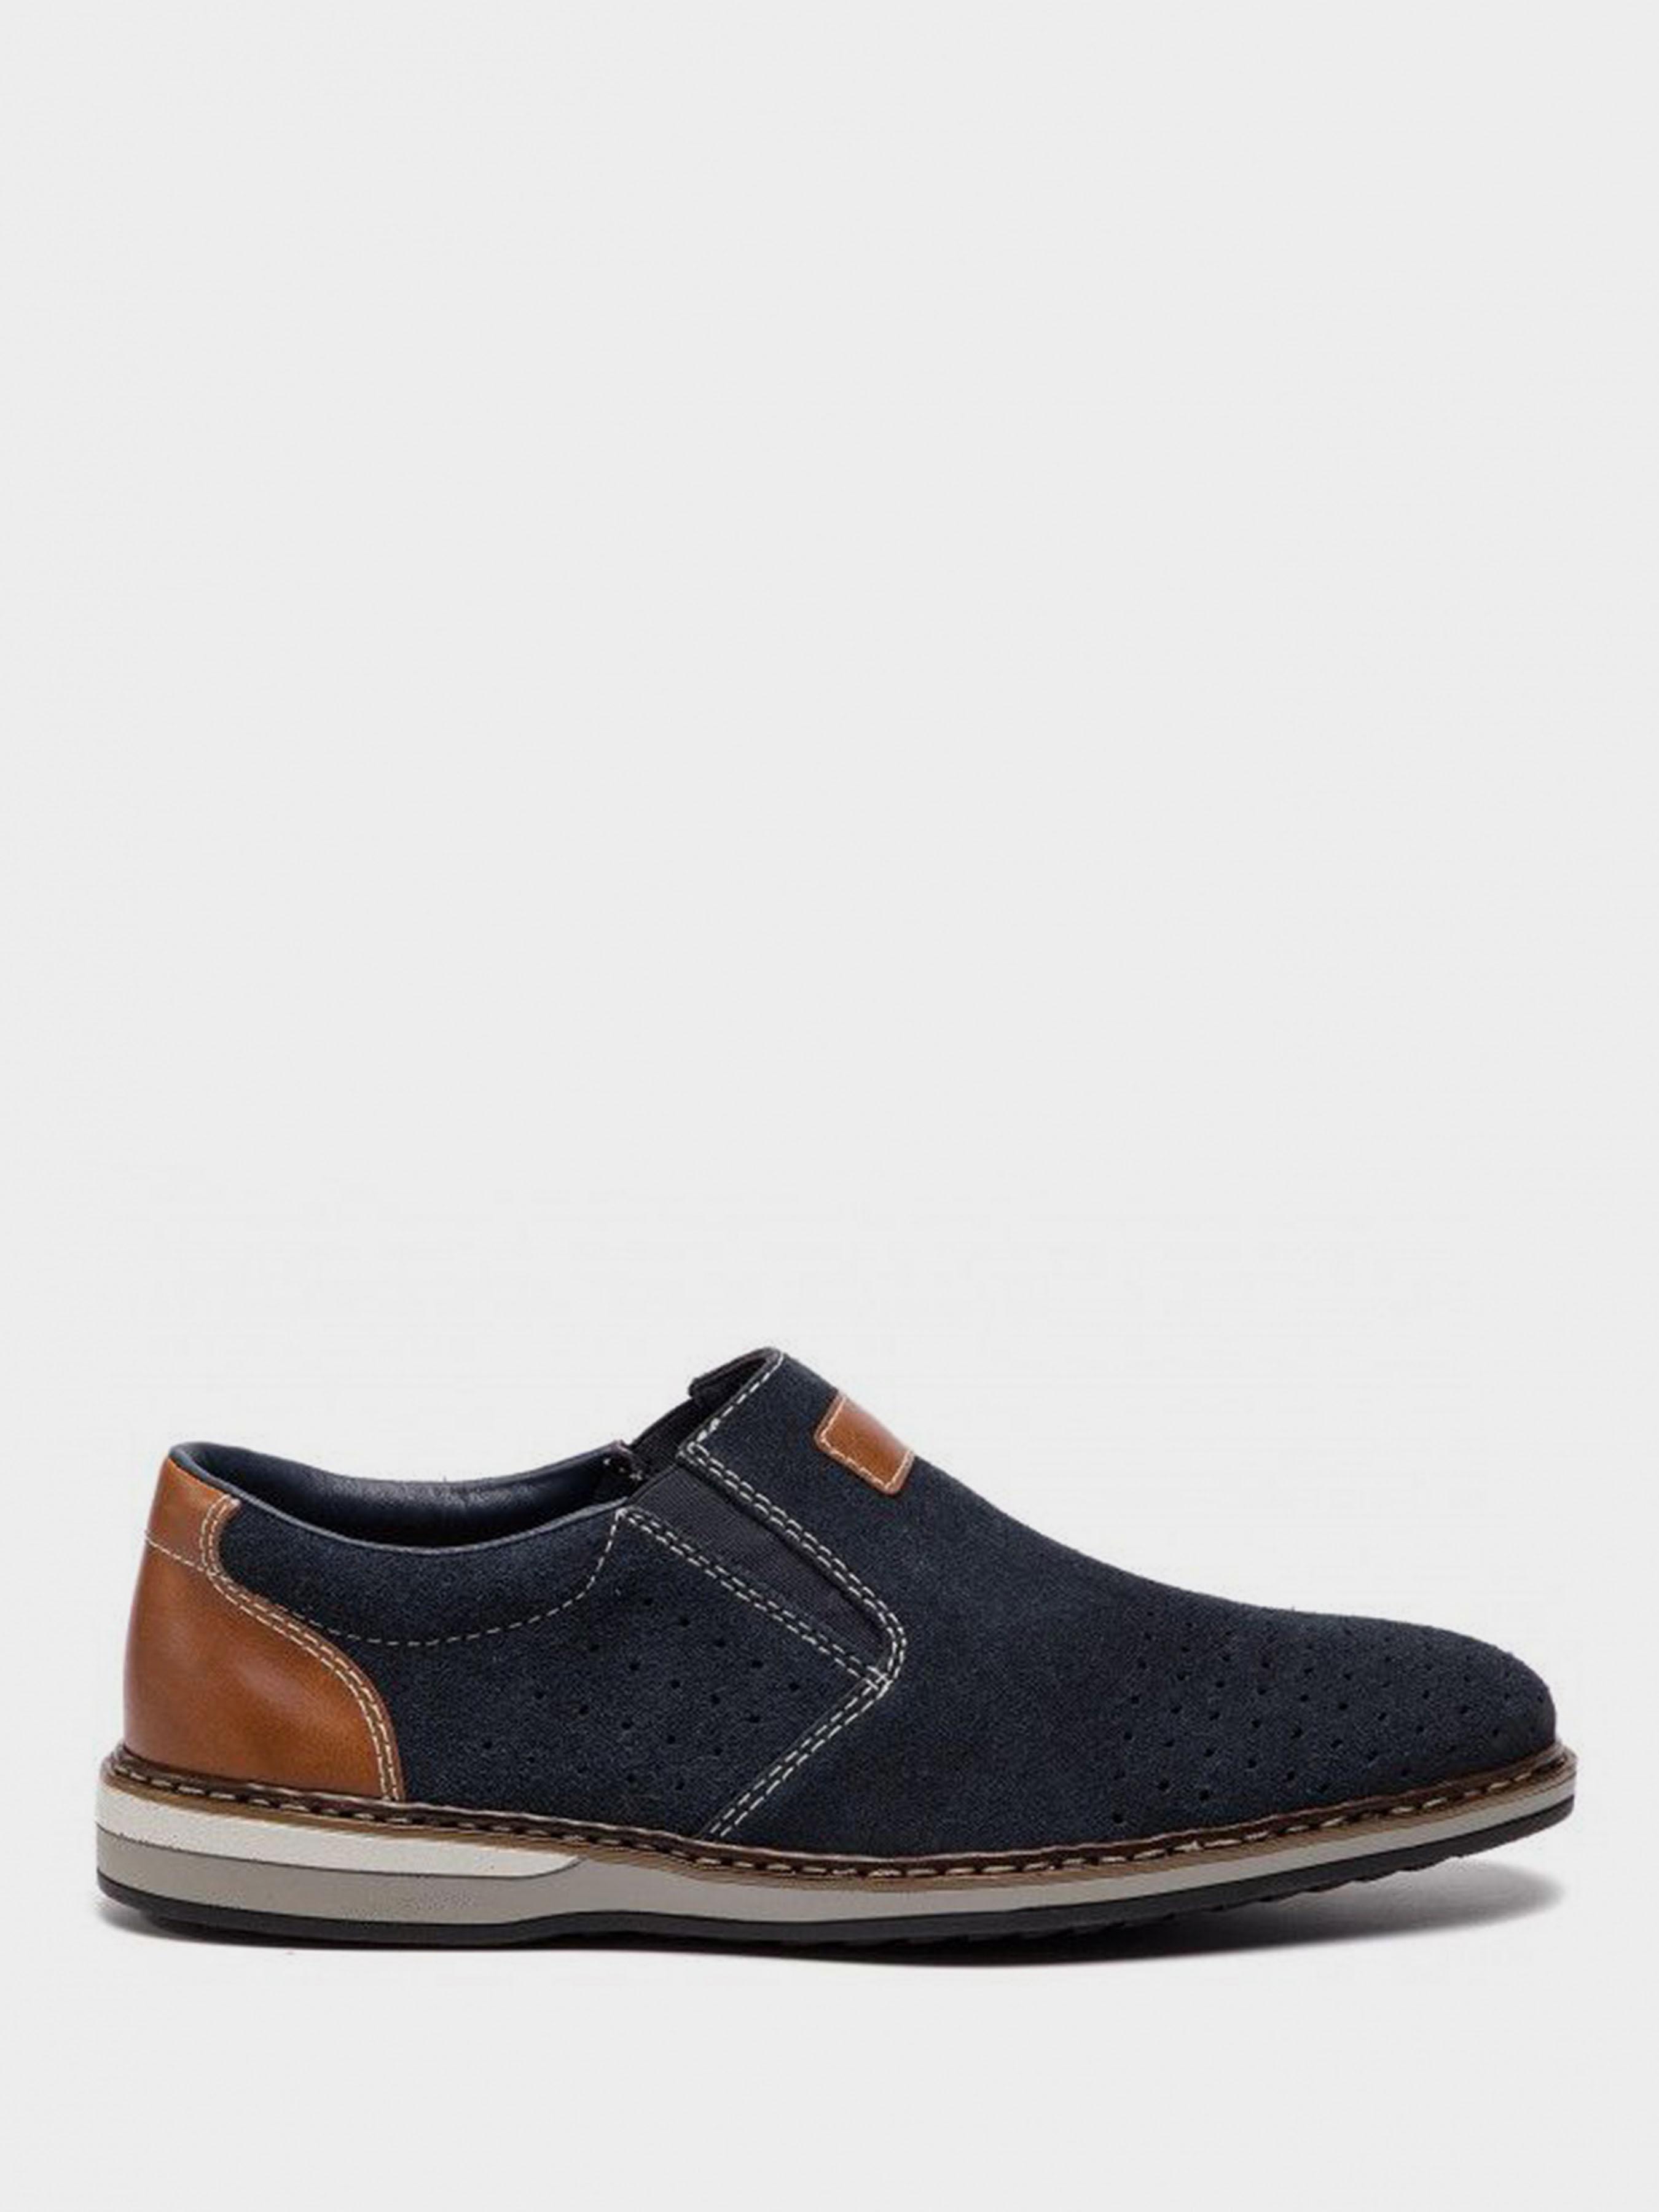 Полуботинки для мужчин RIEKER RK671 размеры обуви, 2017